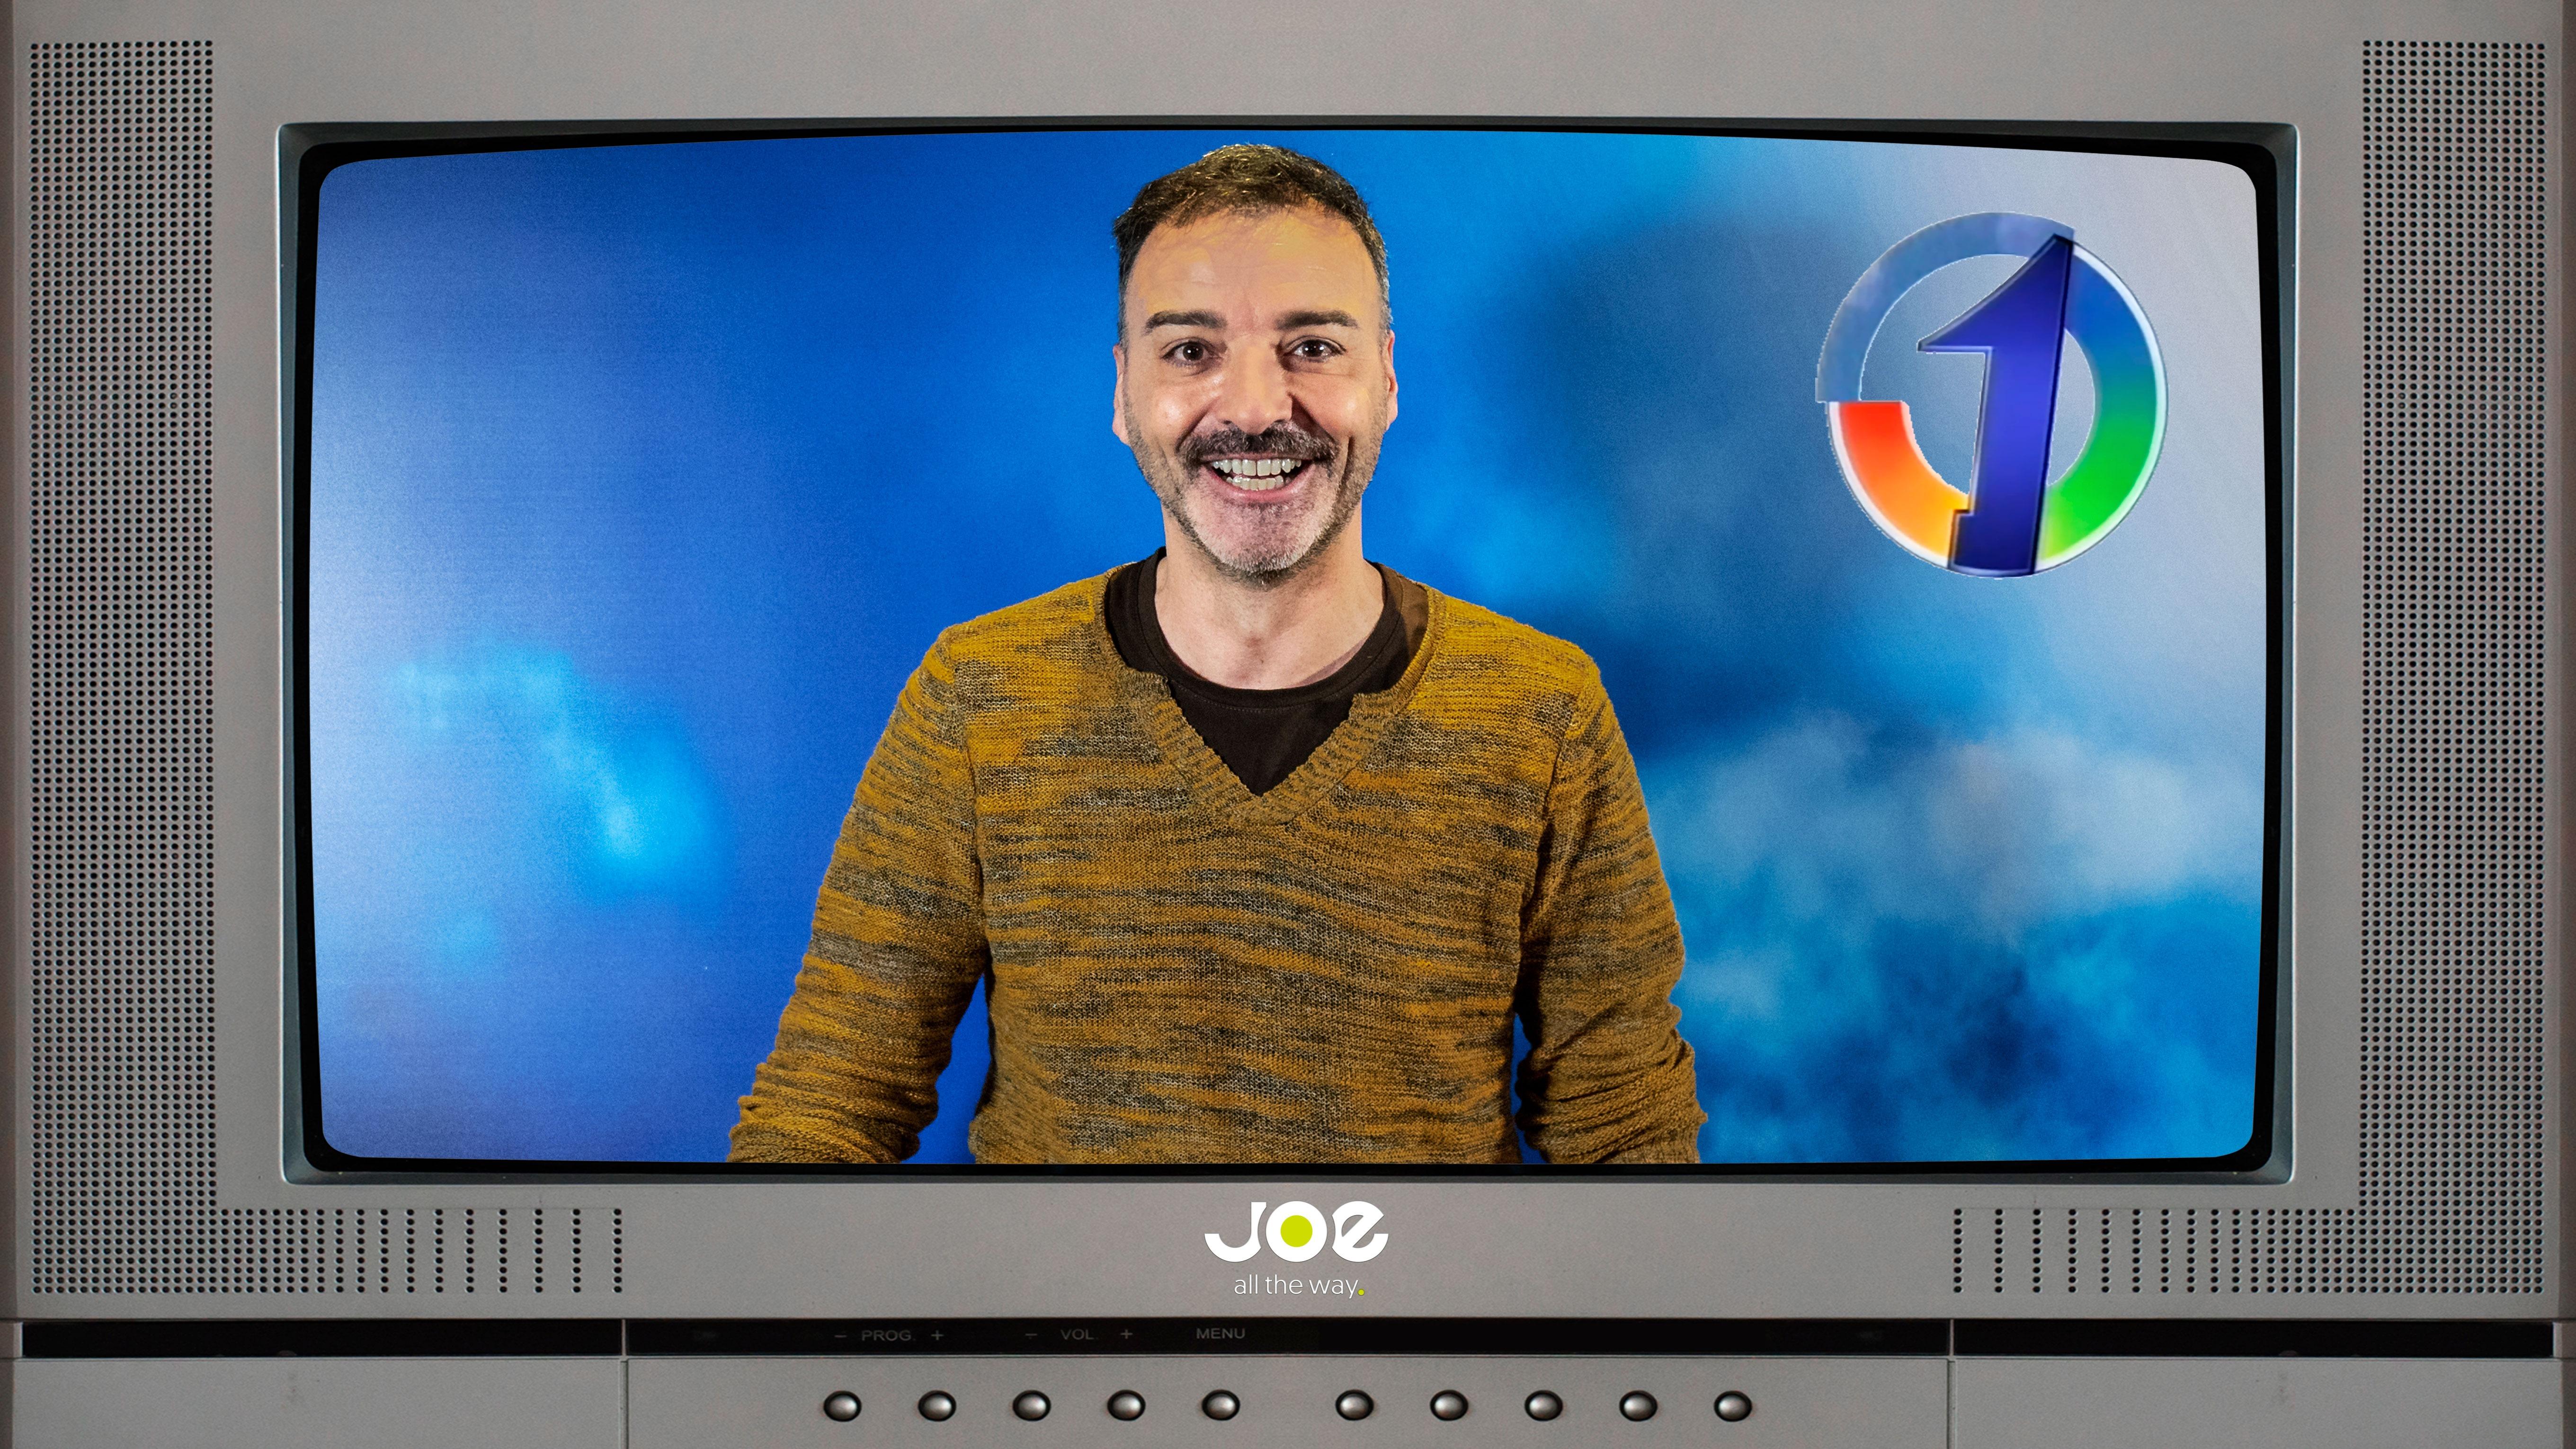 Joe 90s tv celebrate johan